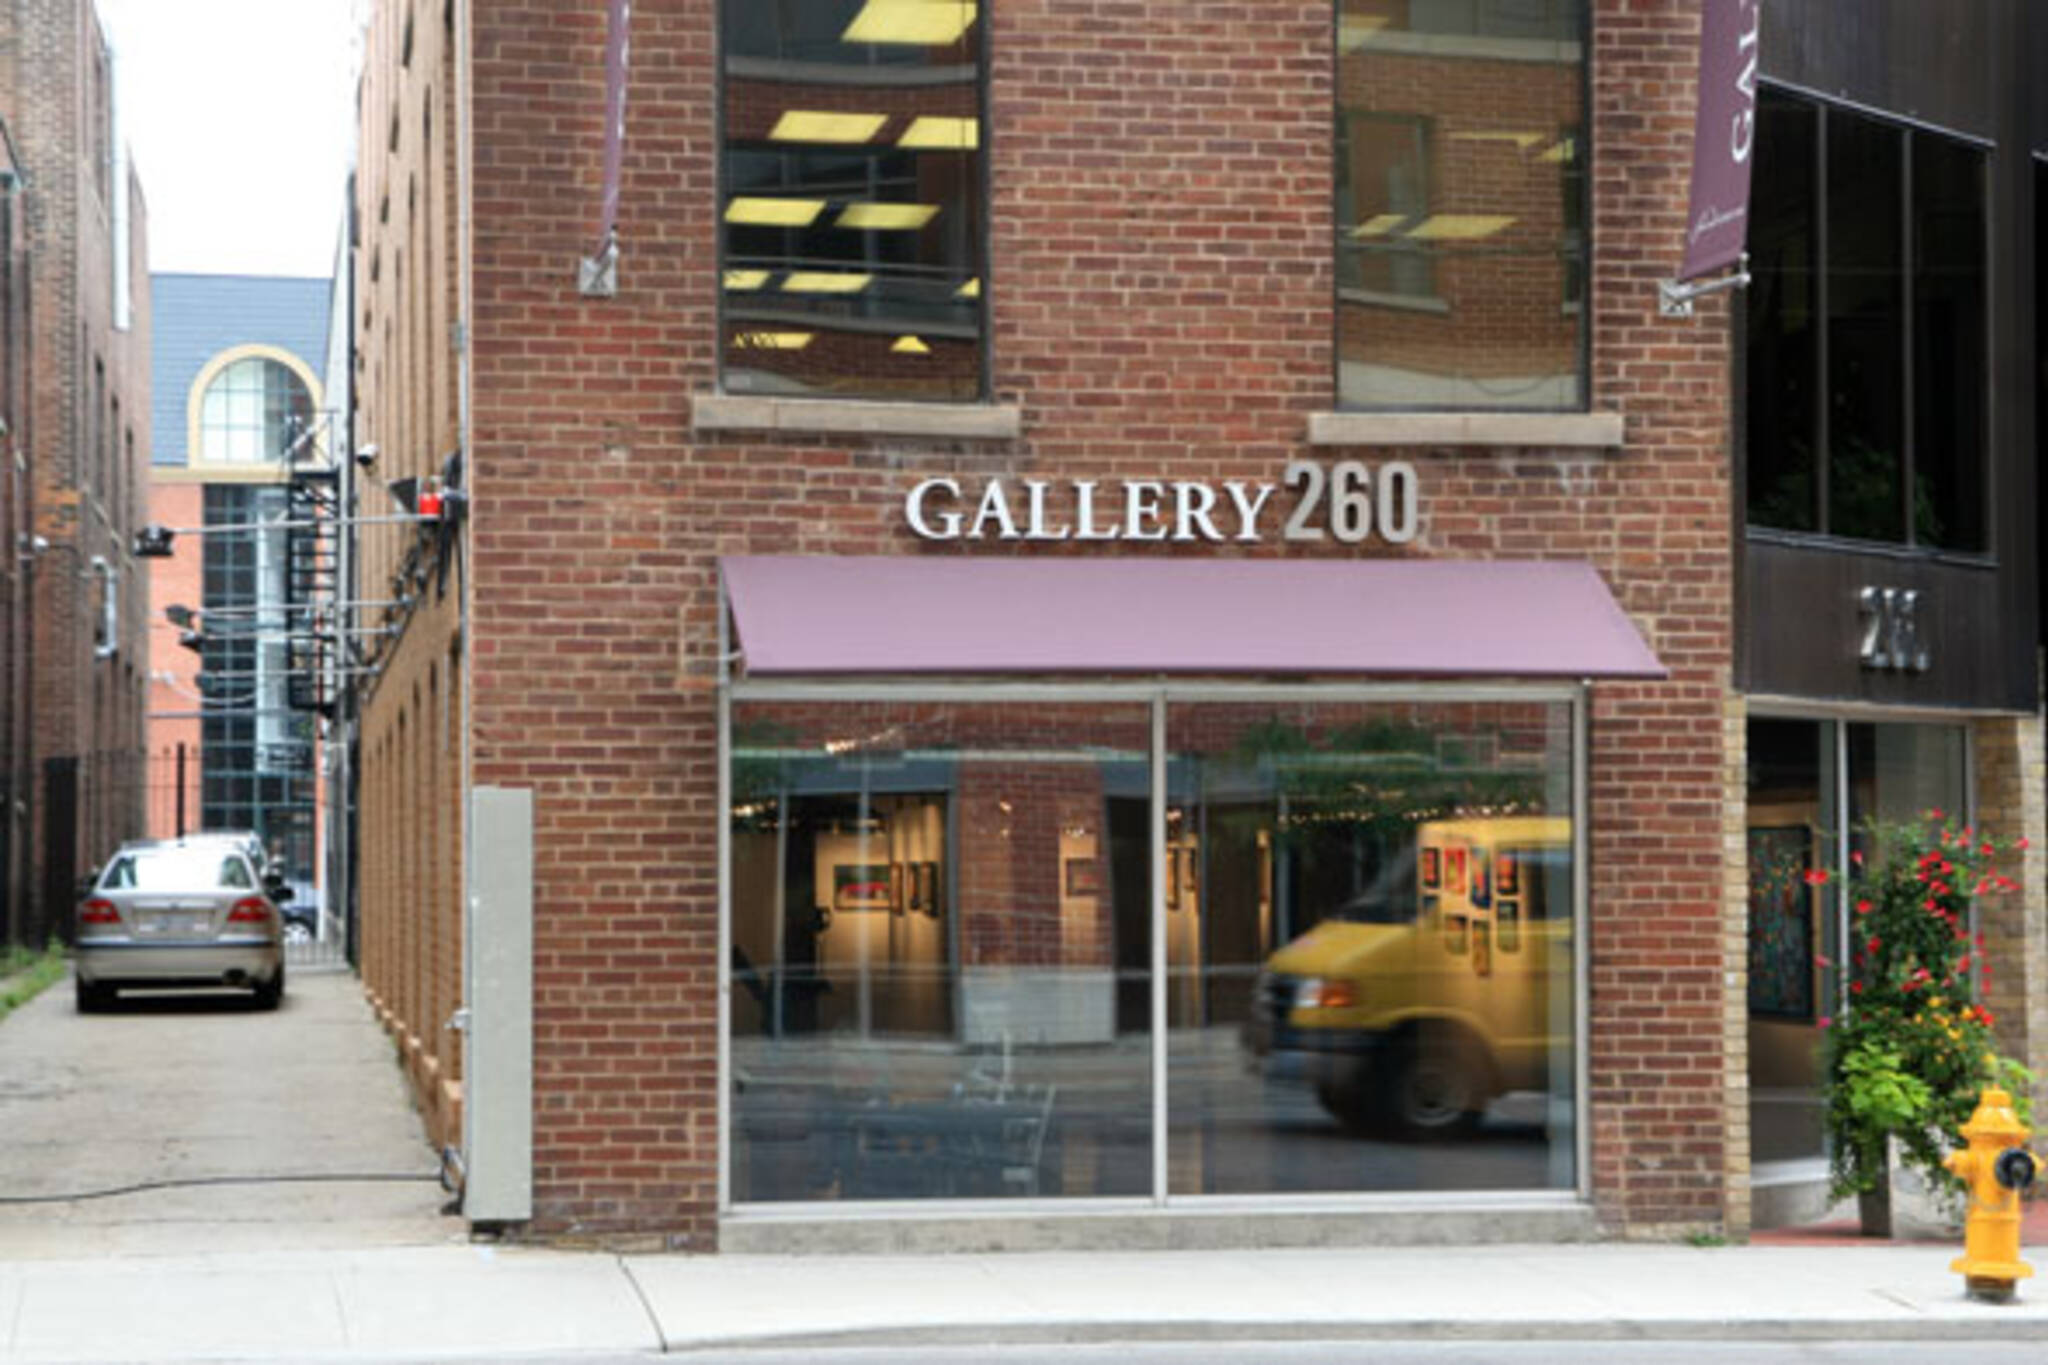 Gallery 260 Toronto